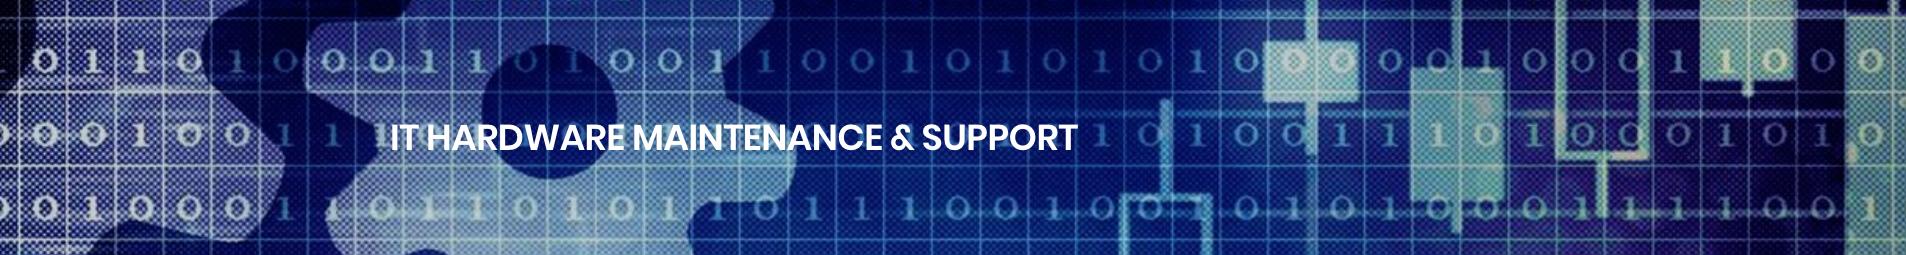 Advanced Business Technology Blog - SECURE BUSINESS TECHNOLOGY